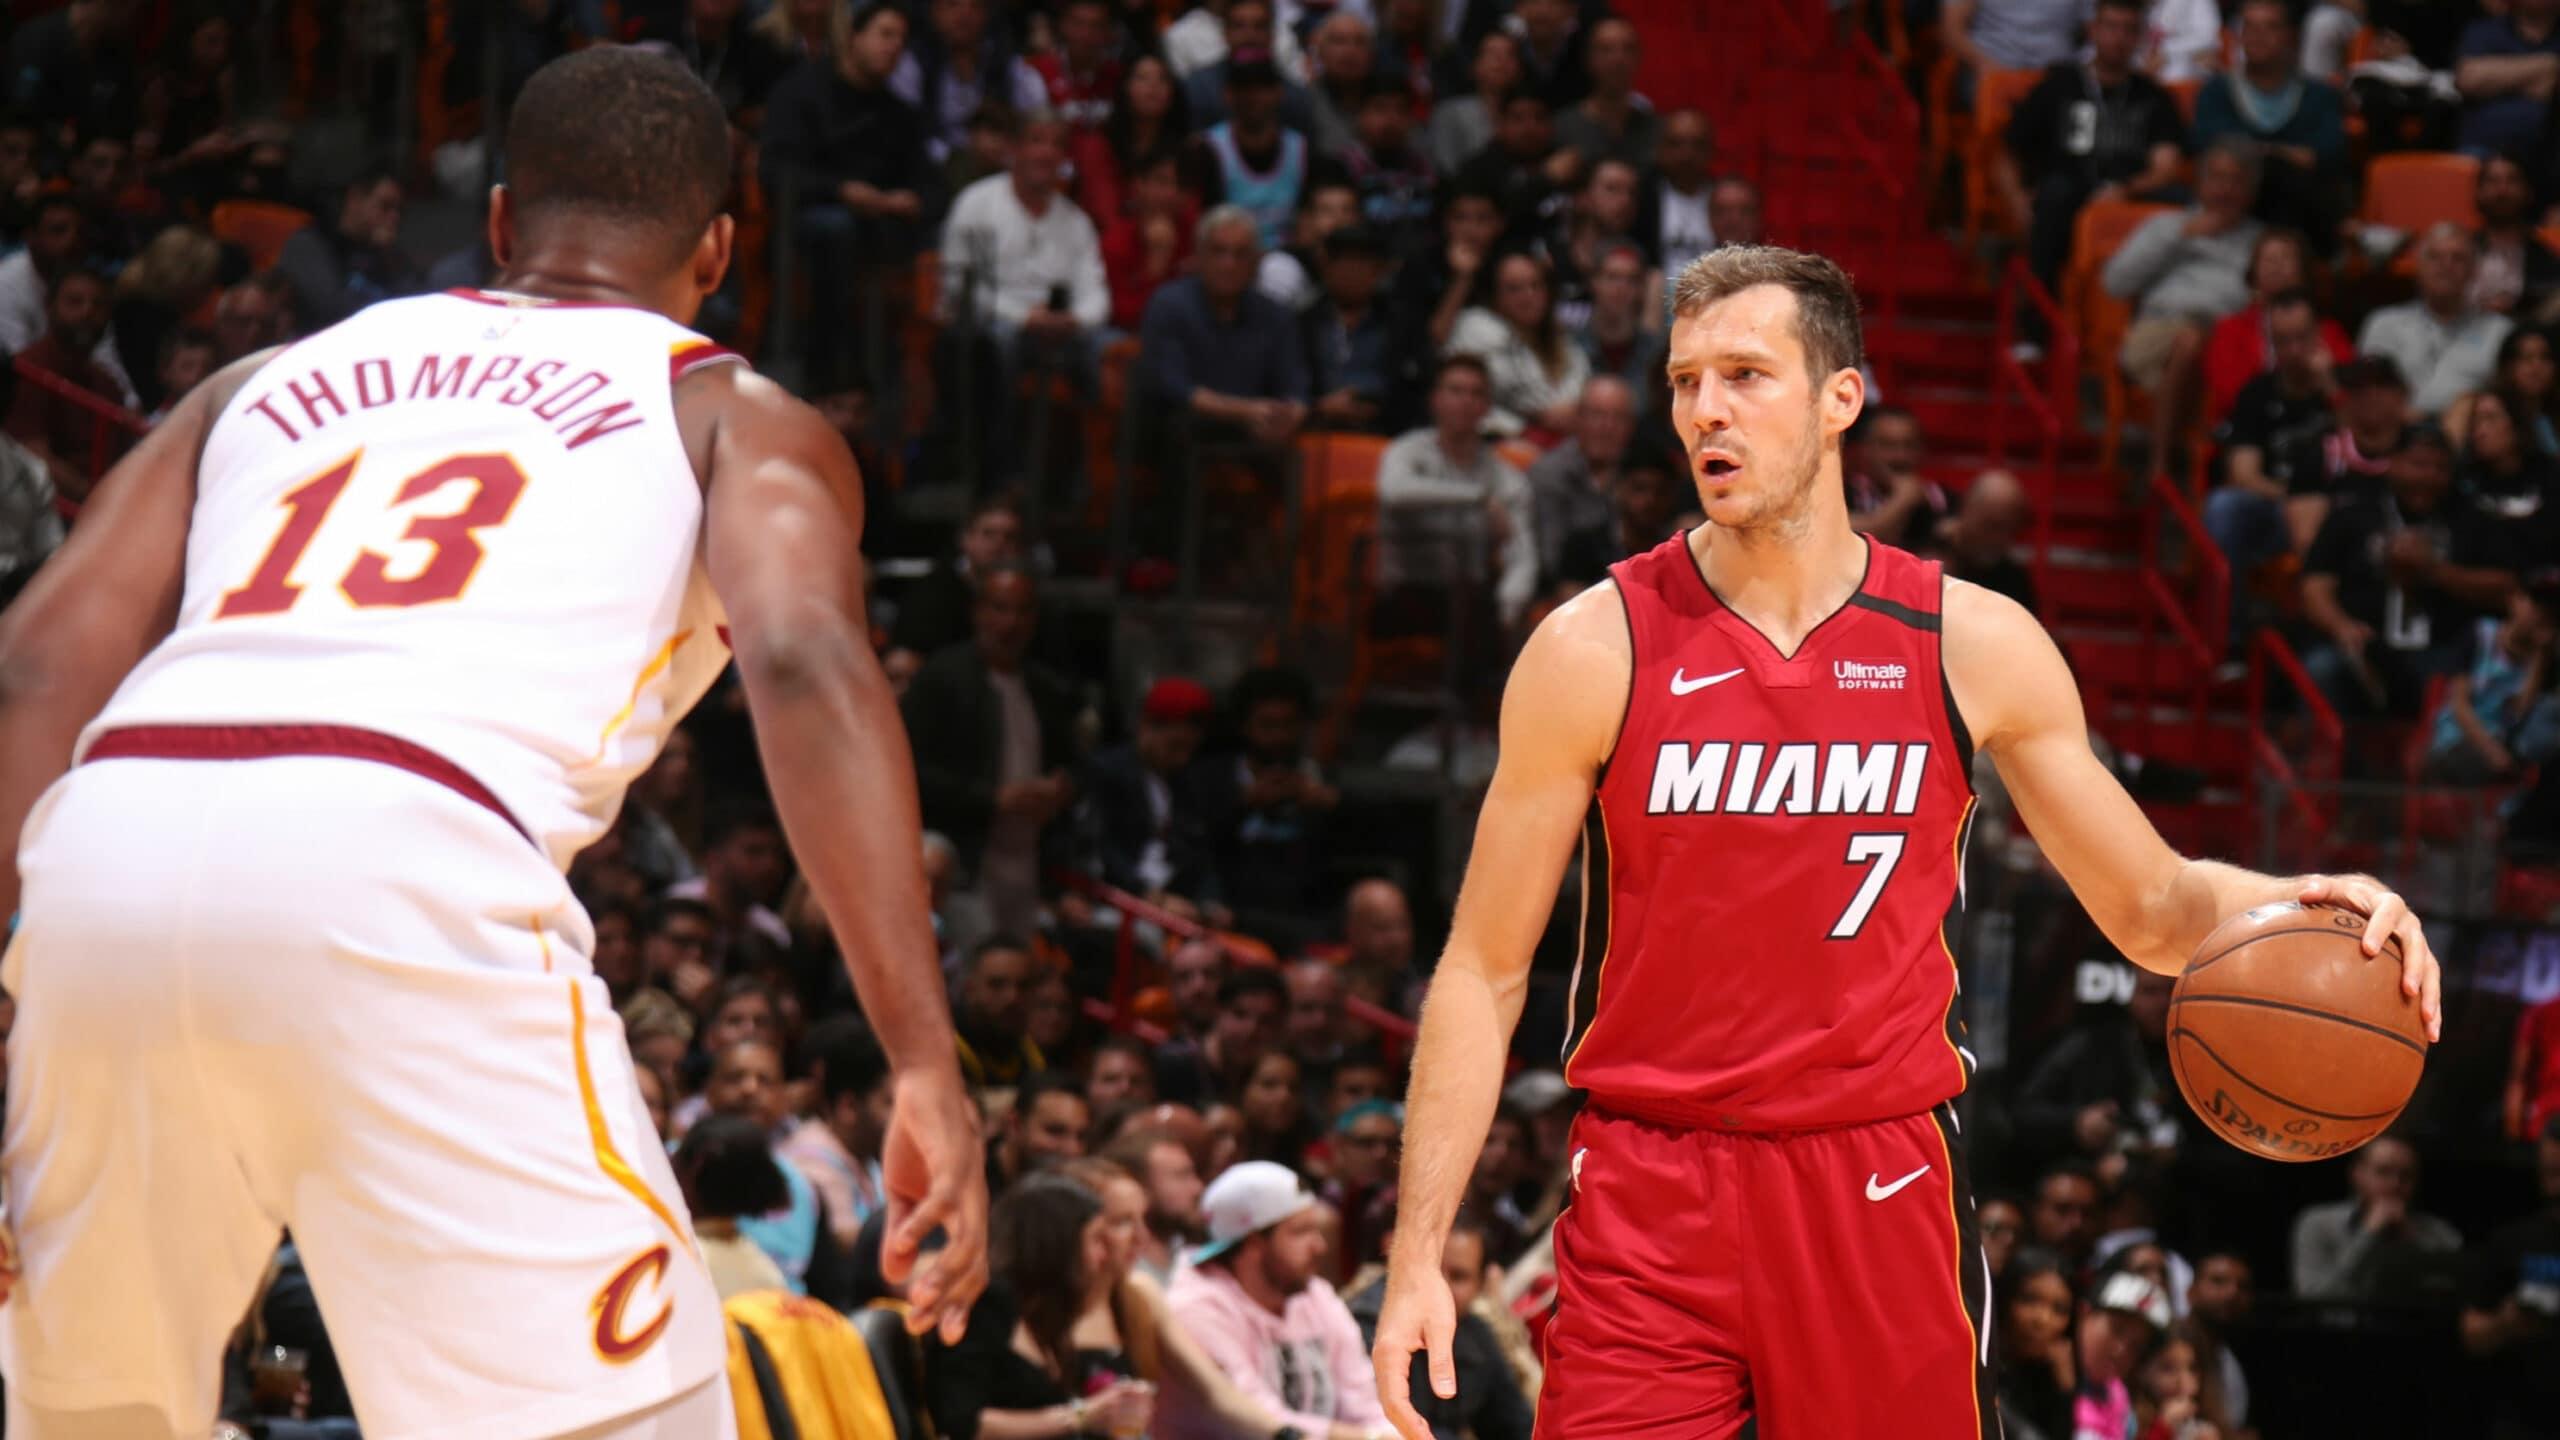 Cavaliers @ Heat